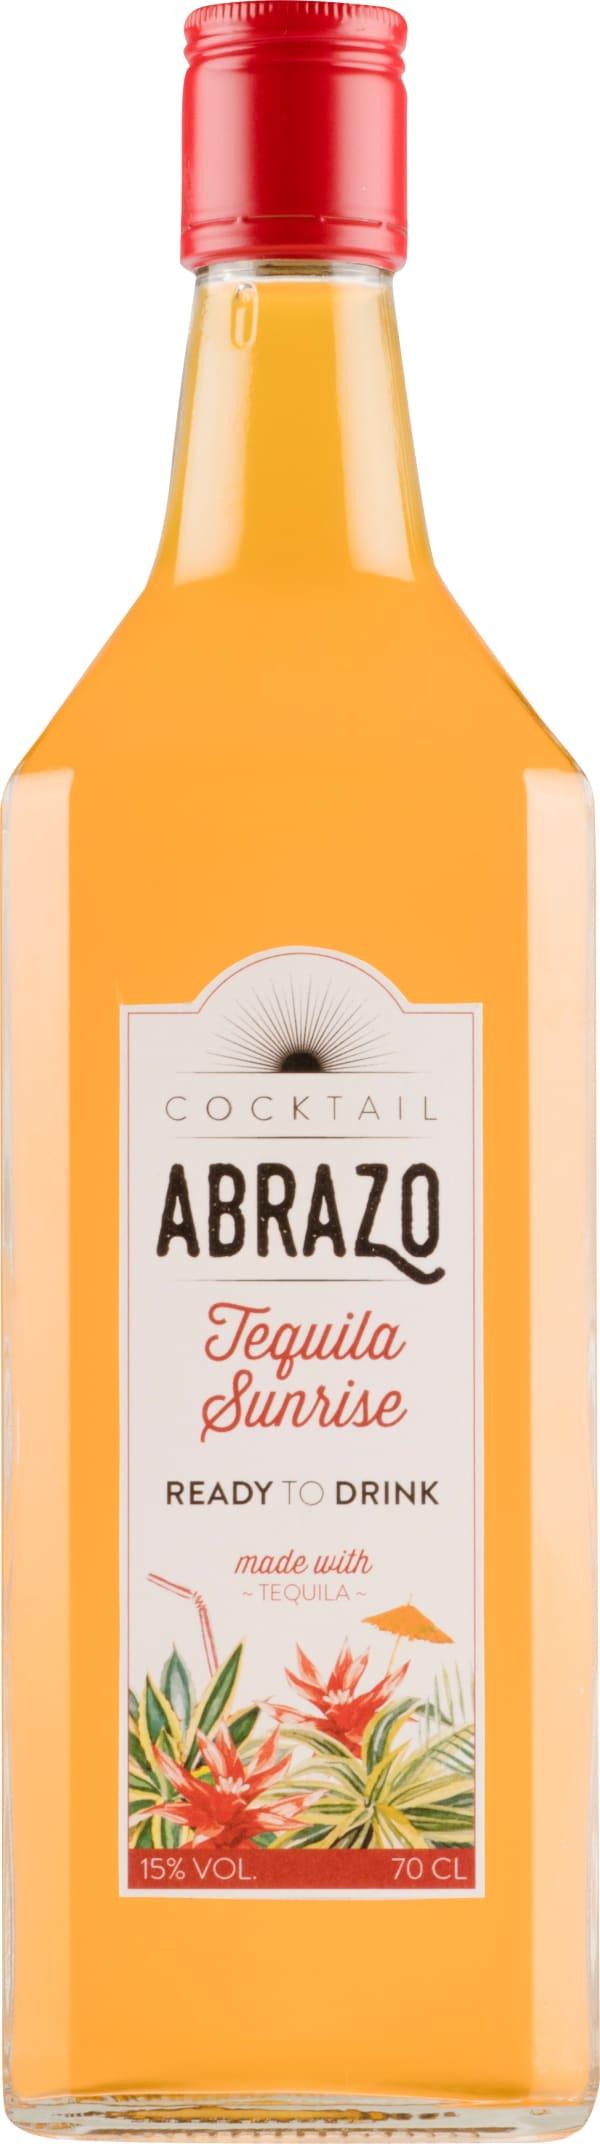 Abrazo Tequila Sunrise Cocktail